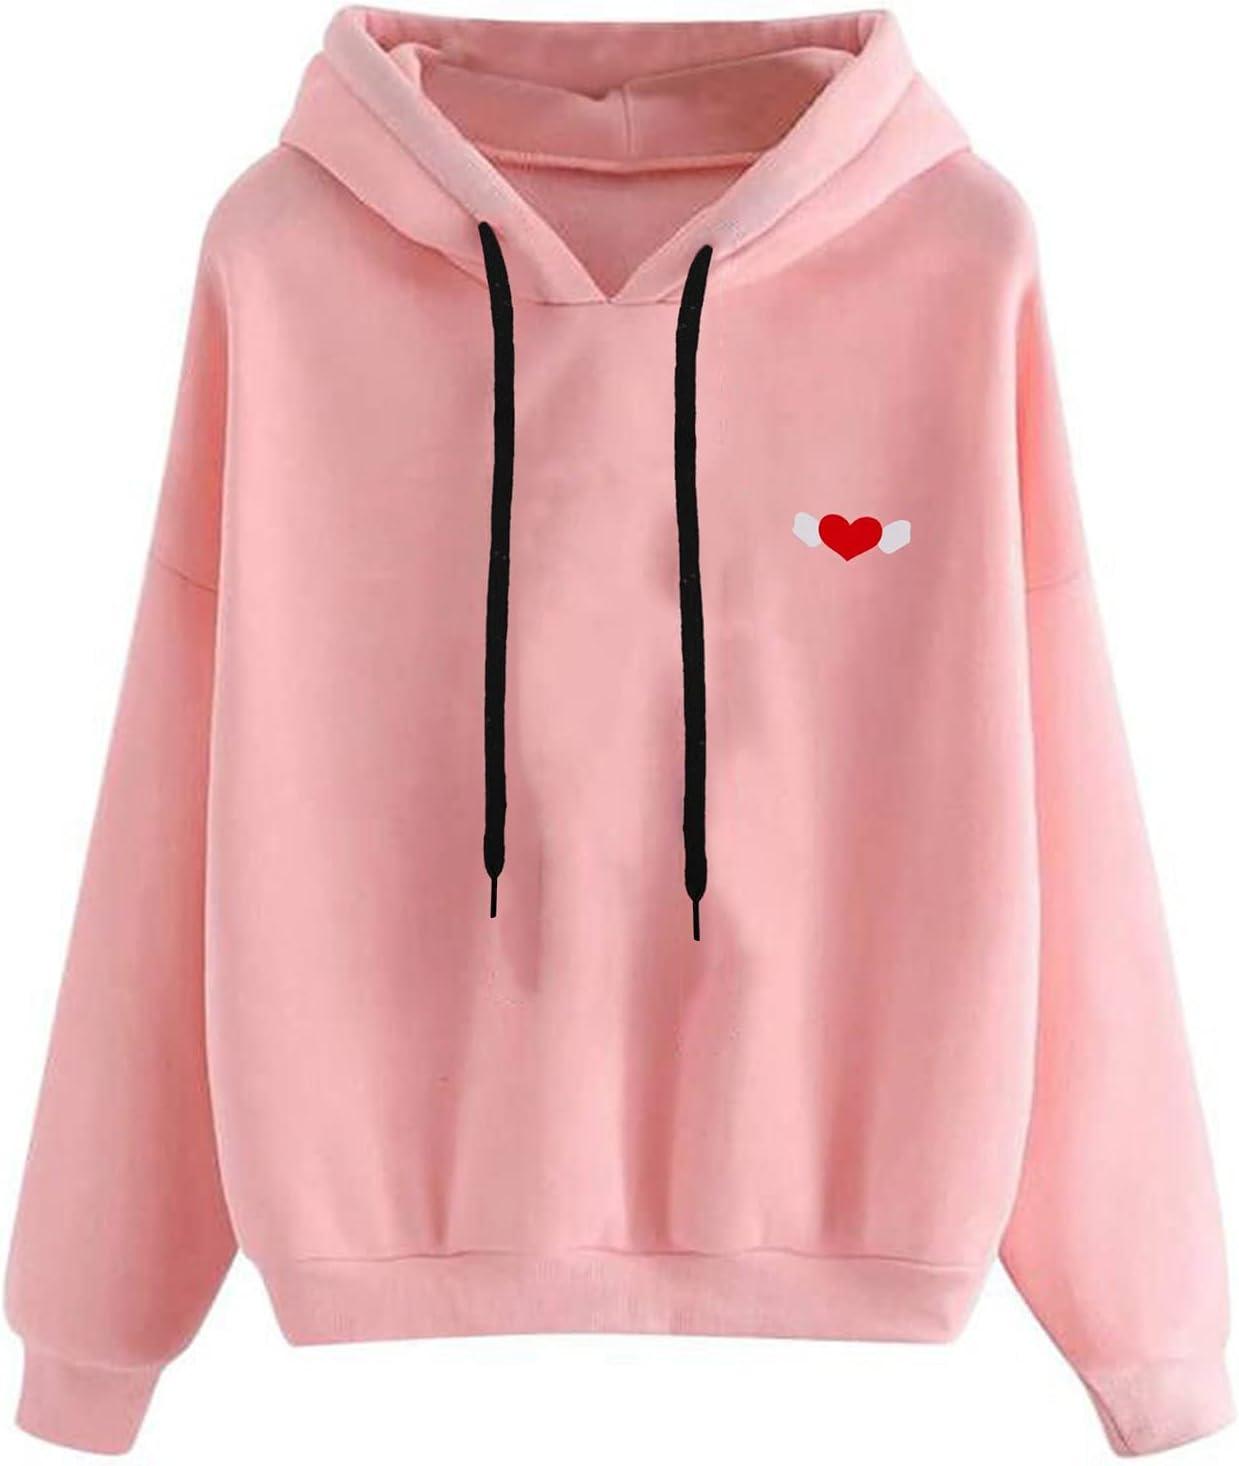 Fullwei Sweatshirt for Women Portland Mall Fashion Crewneck Hood NEW Graphic